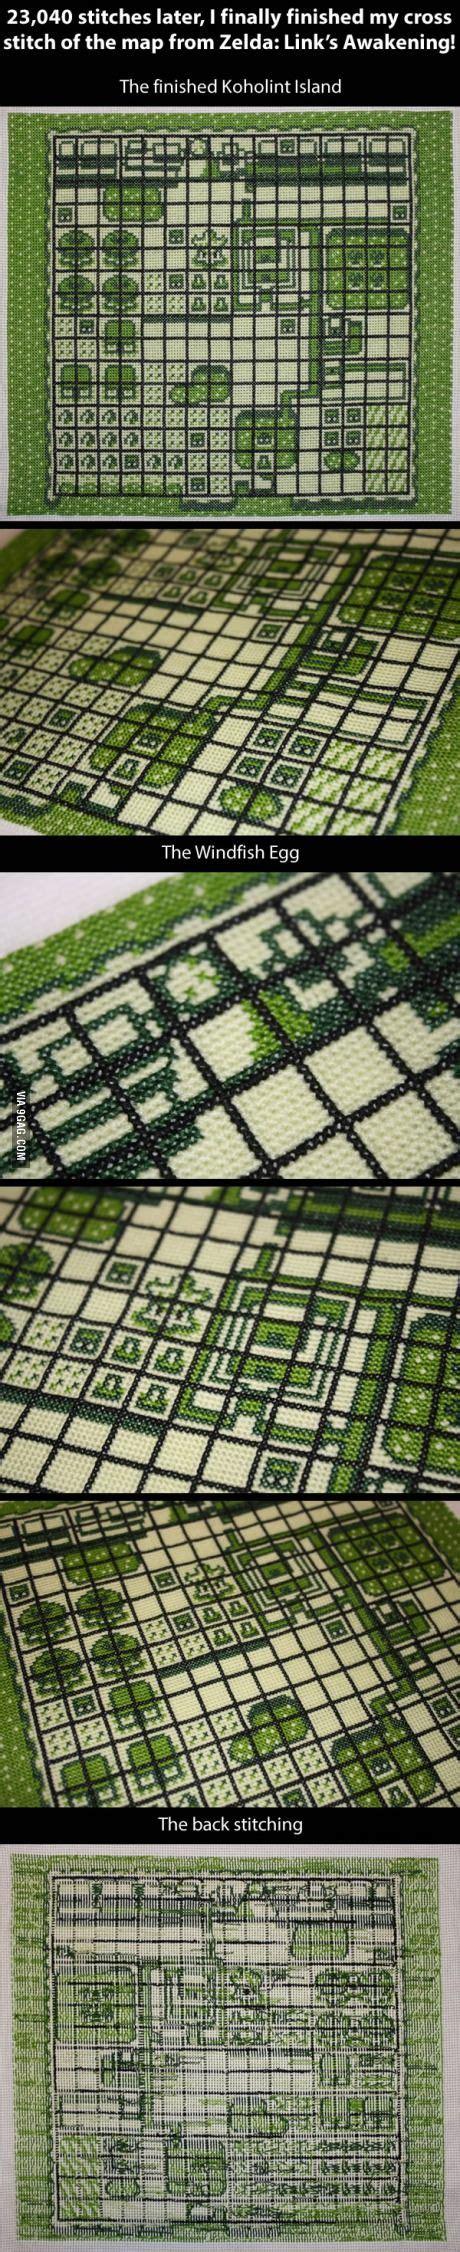 zelda maze pattern 17 best images about legend of zelda perler cross stitch